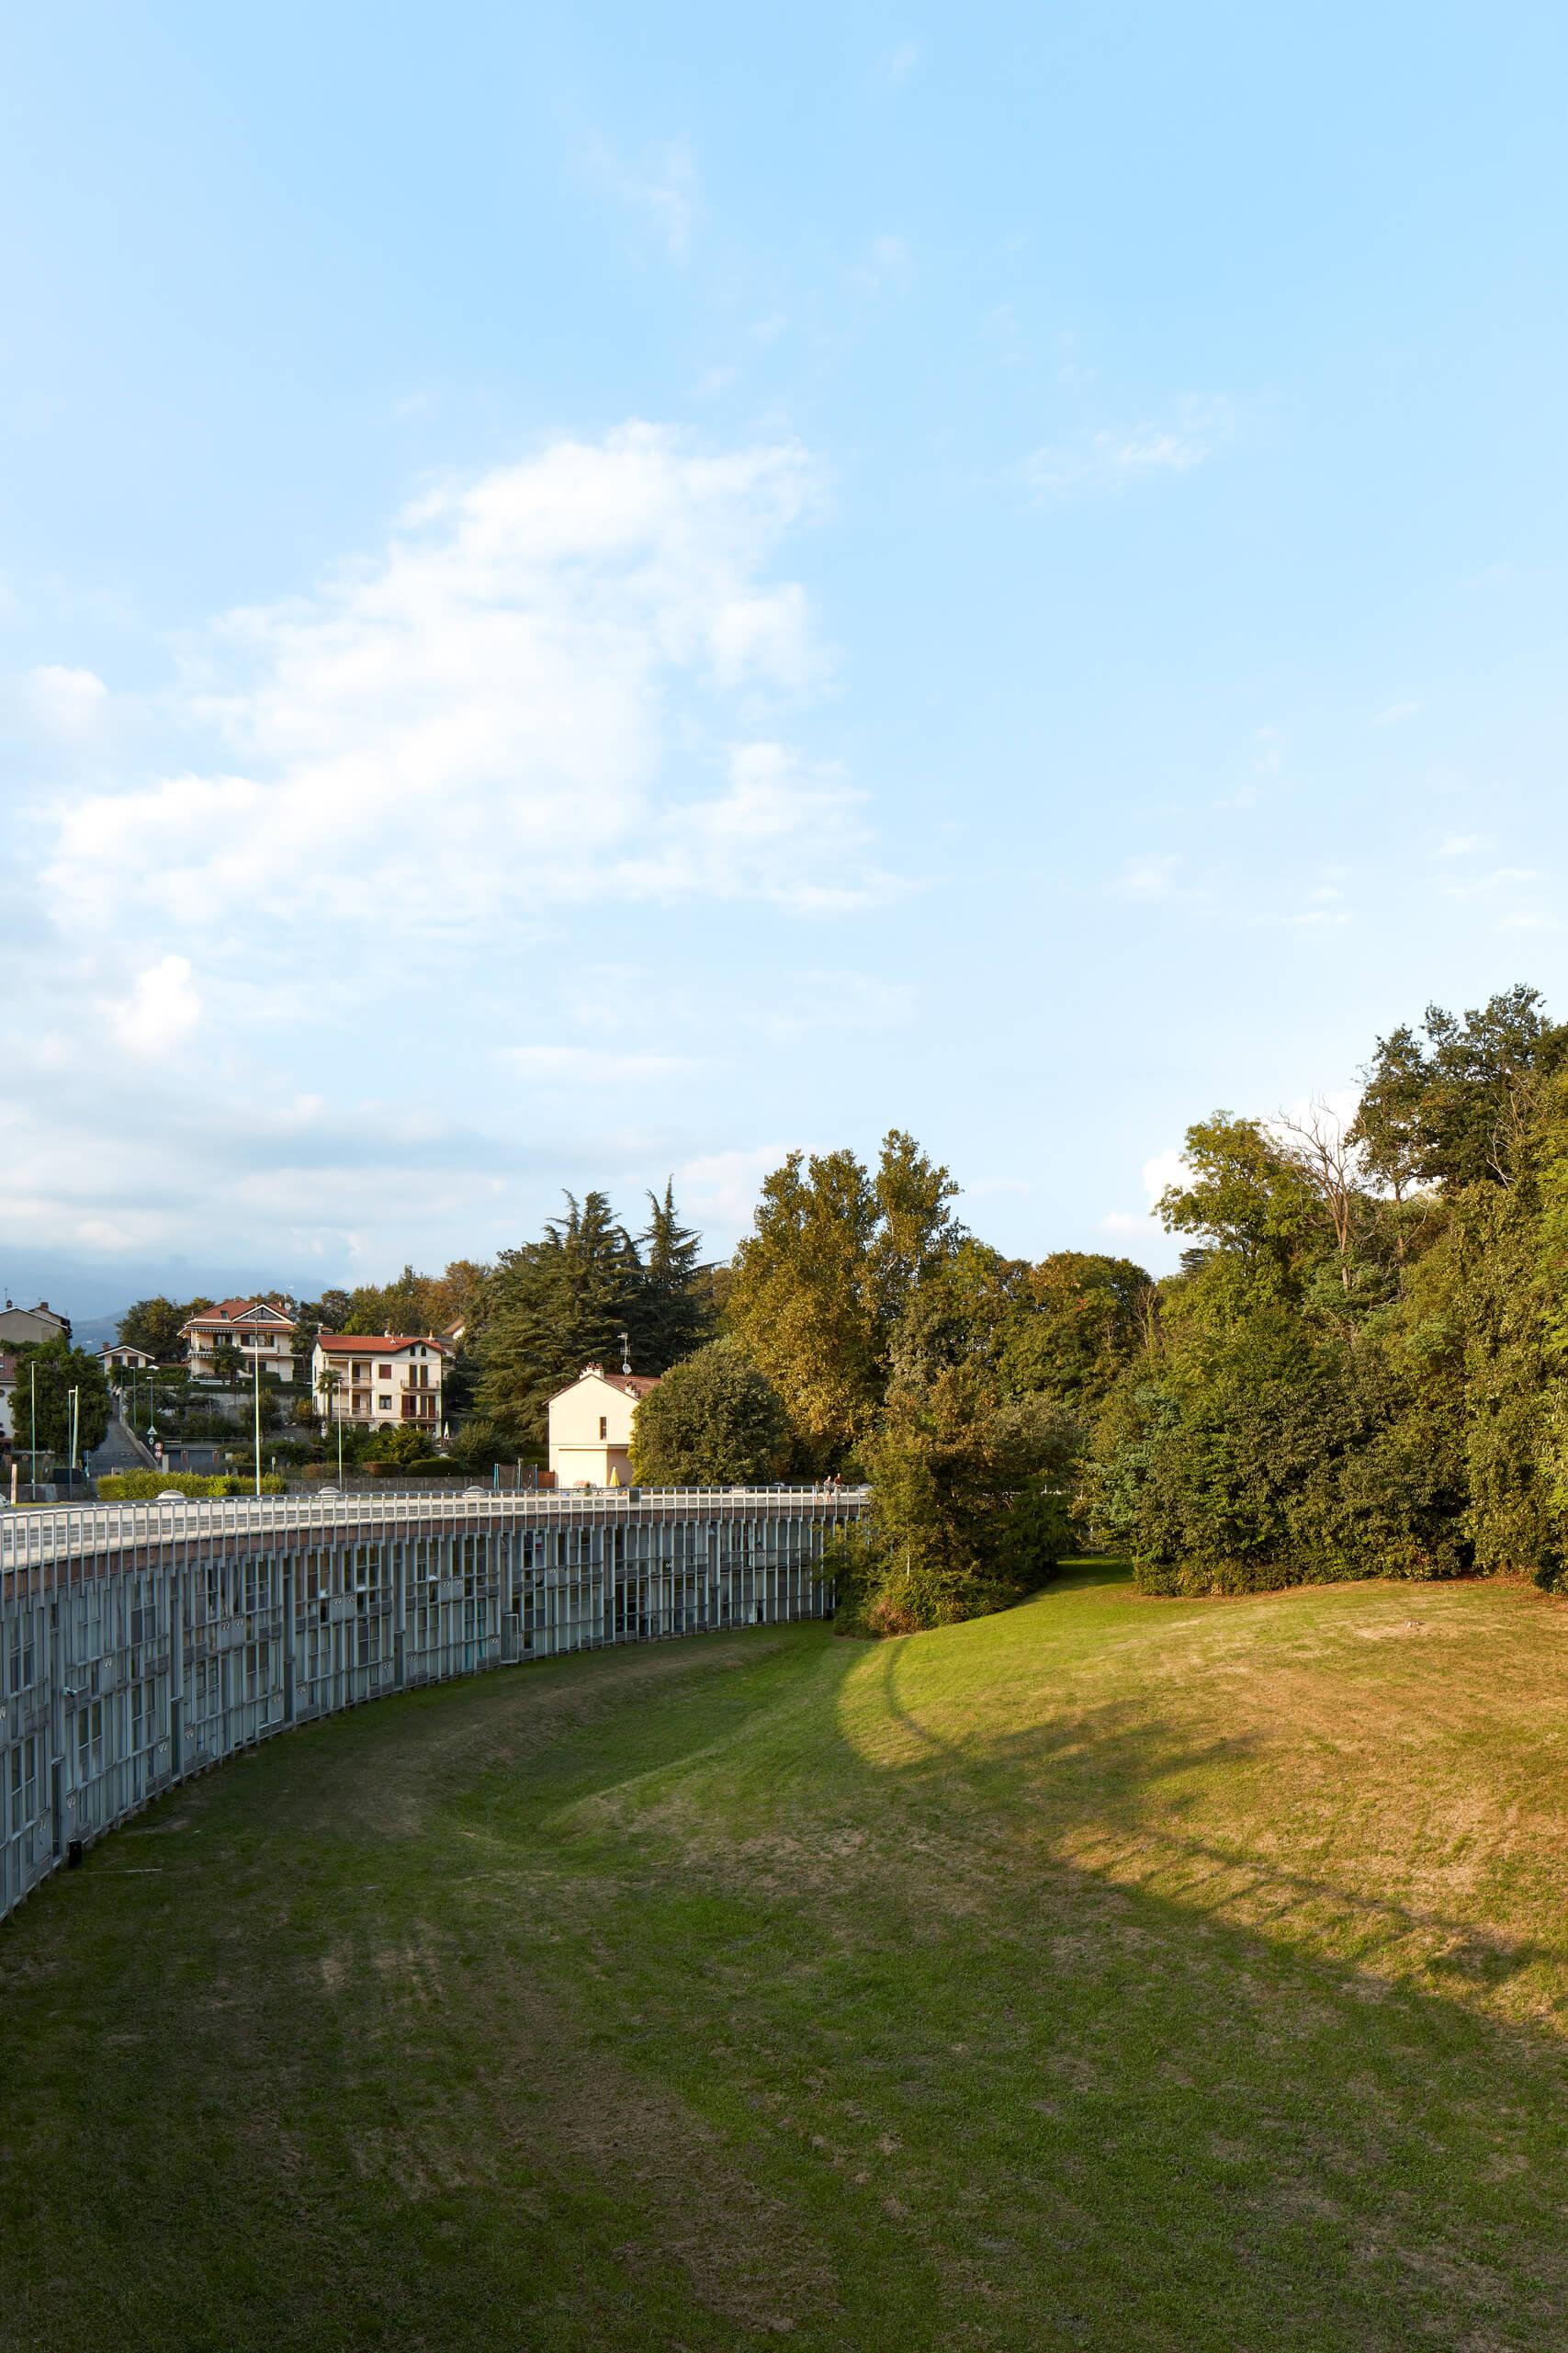 Unità Residenziale Ovest – Talponia – Gabetti D'Isola  – (1968-1971) – Ivrea – Italy